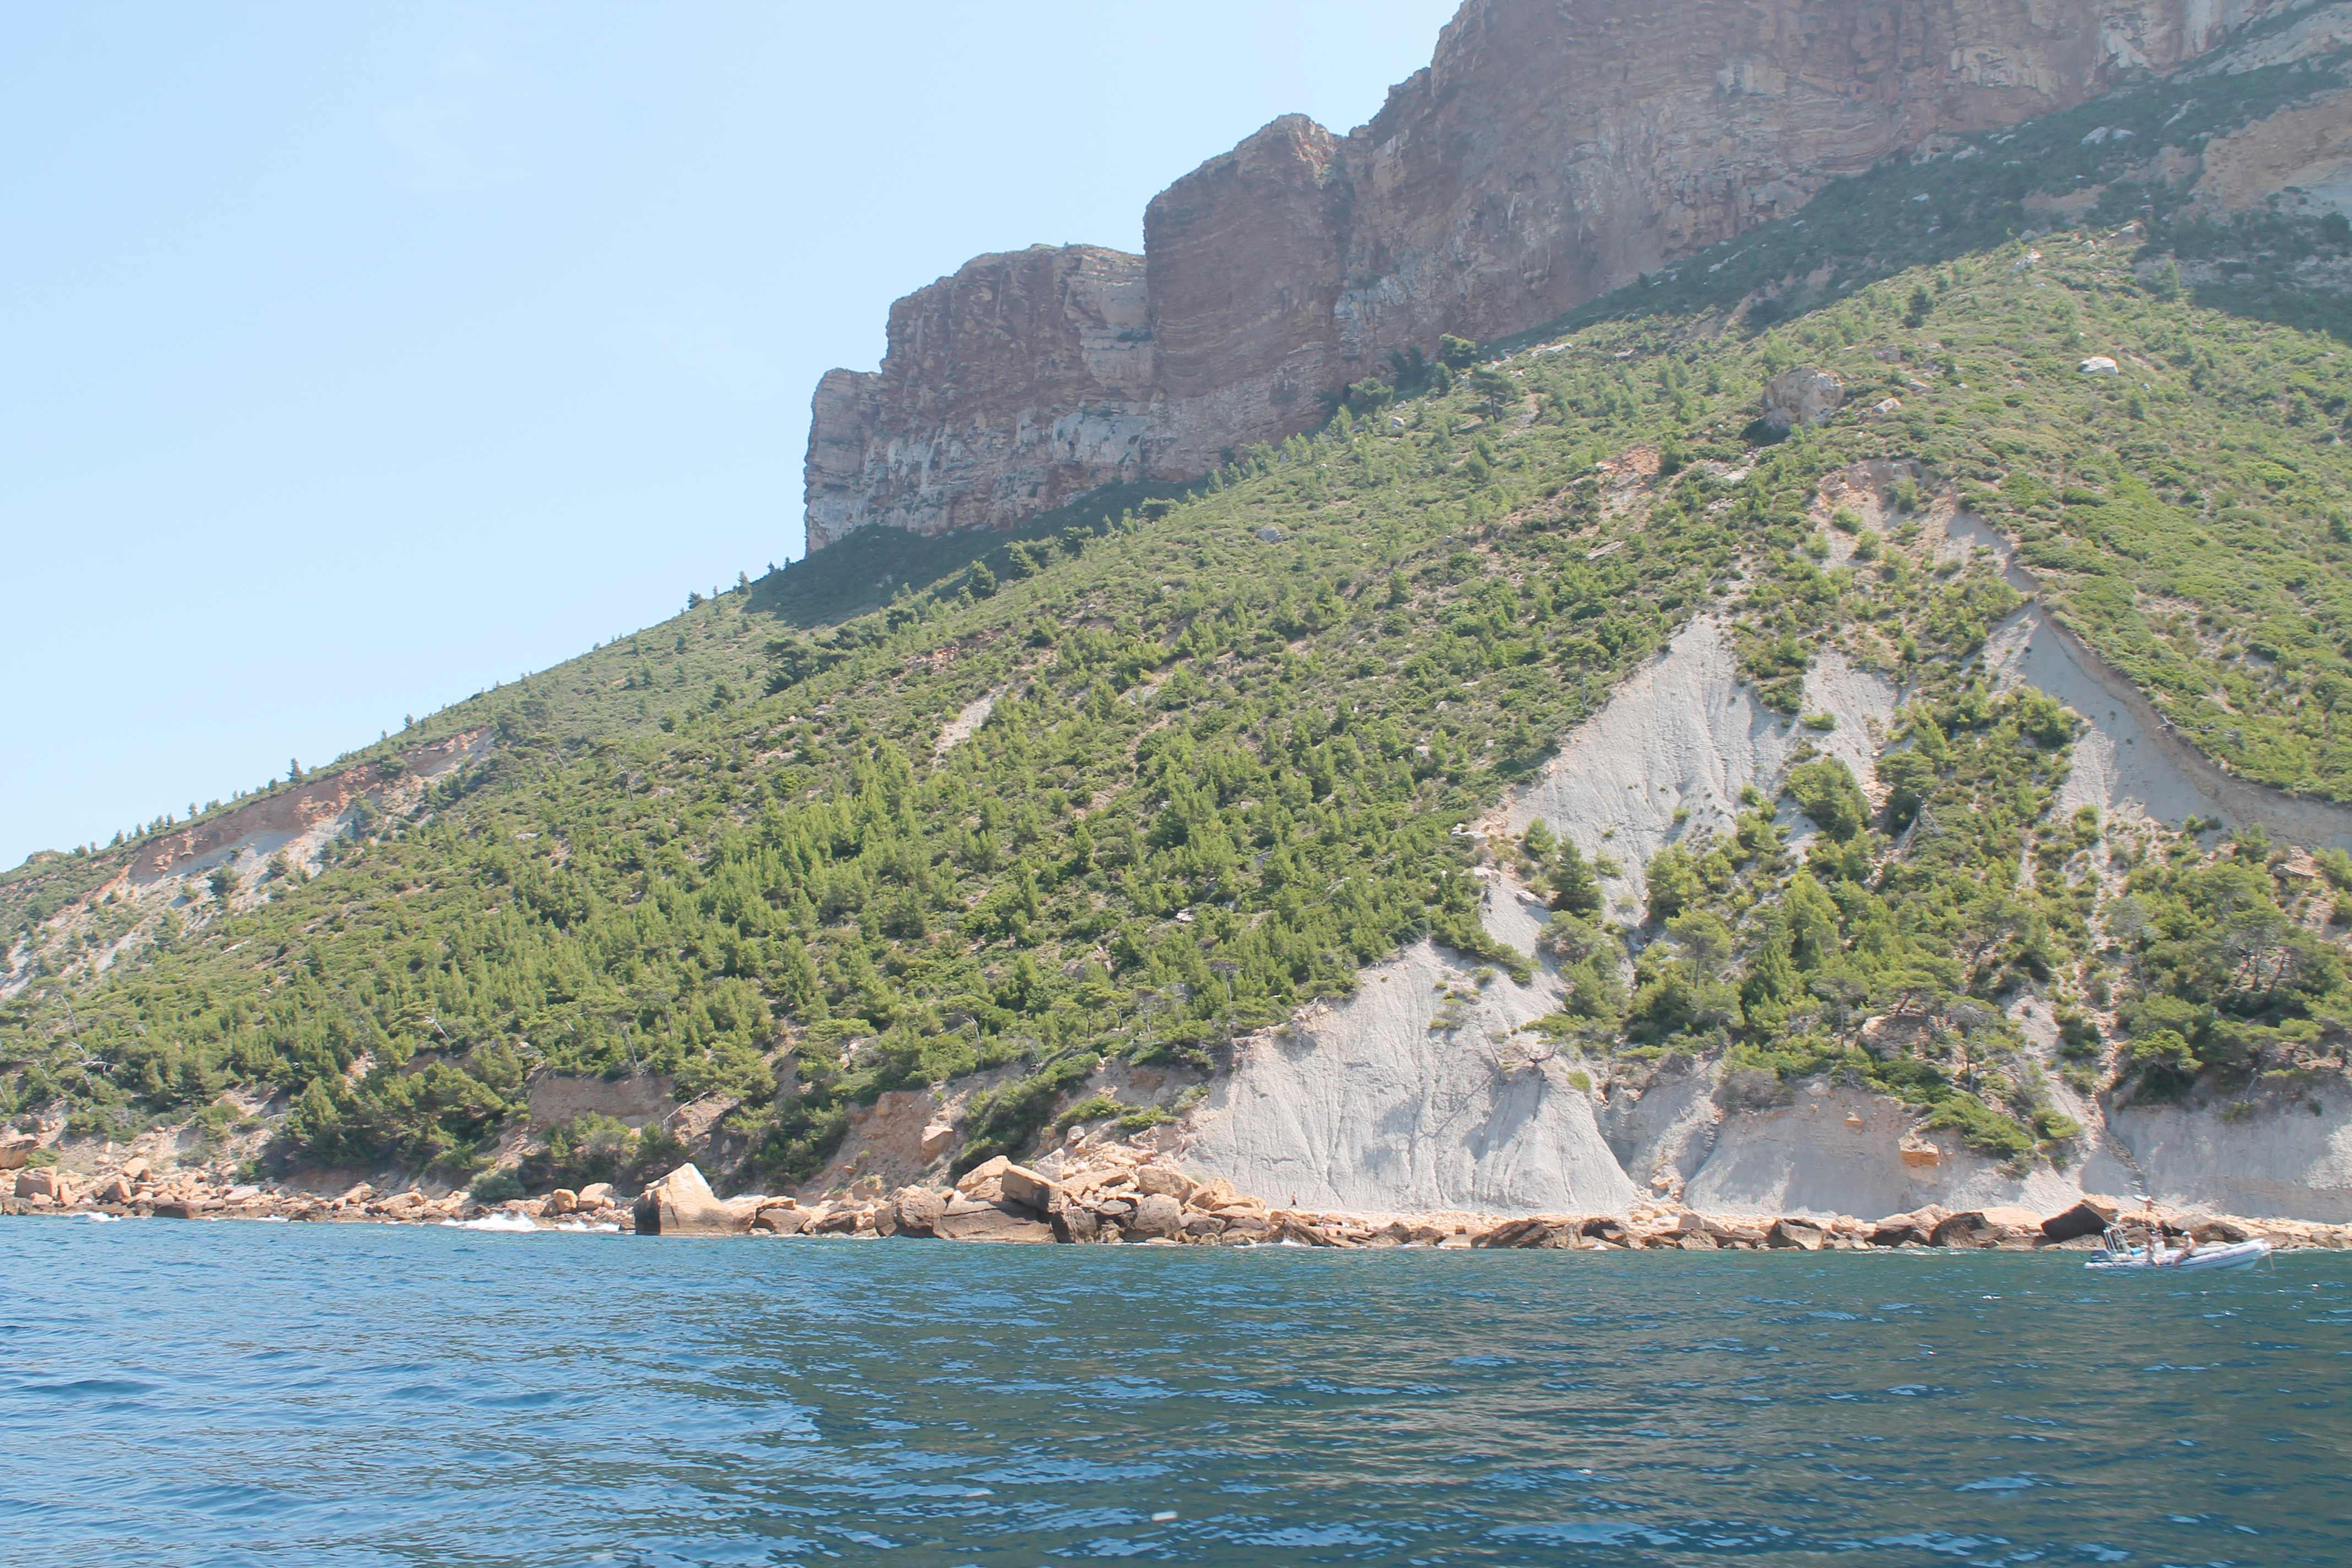 Wine and sailboat, cliffs near Marseille